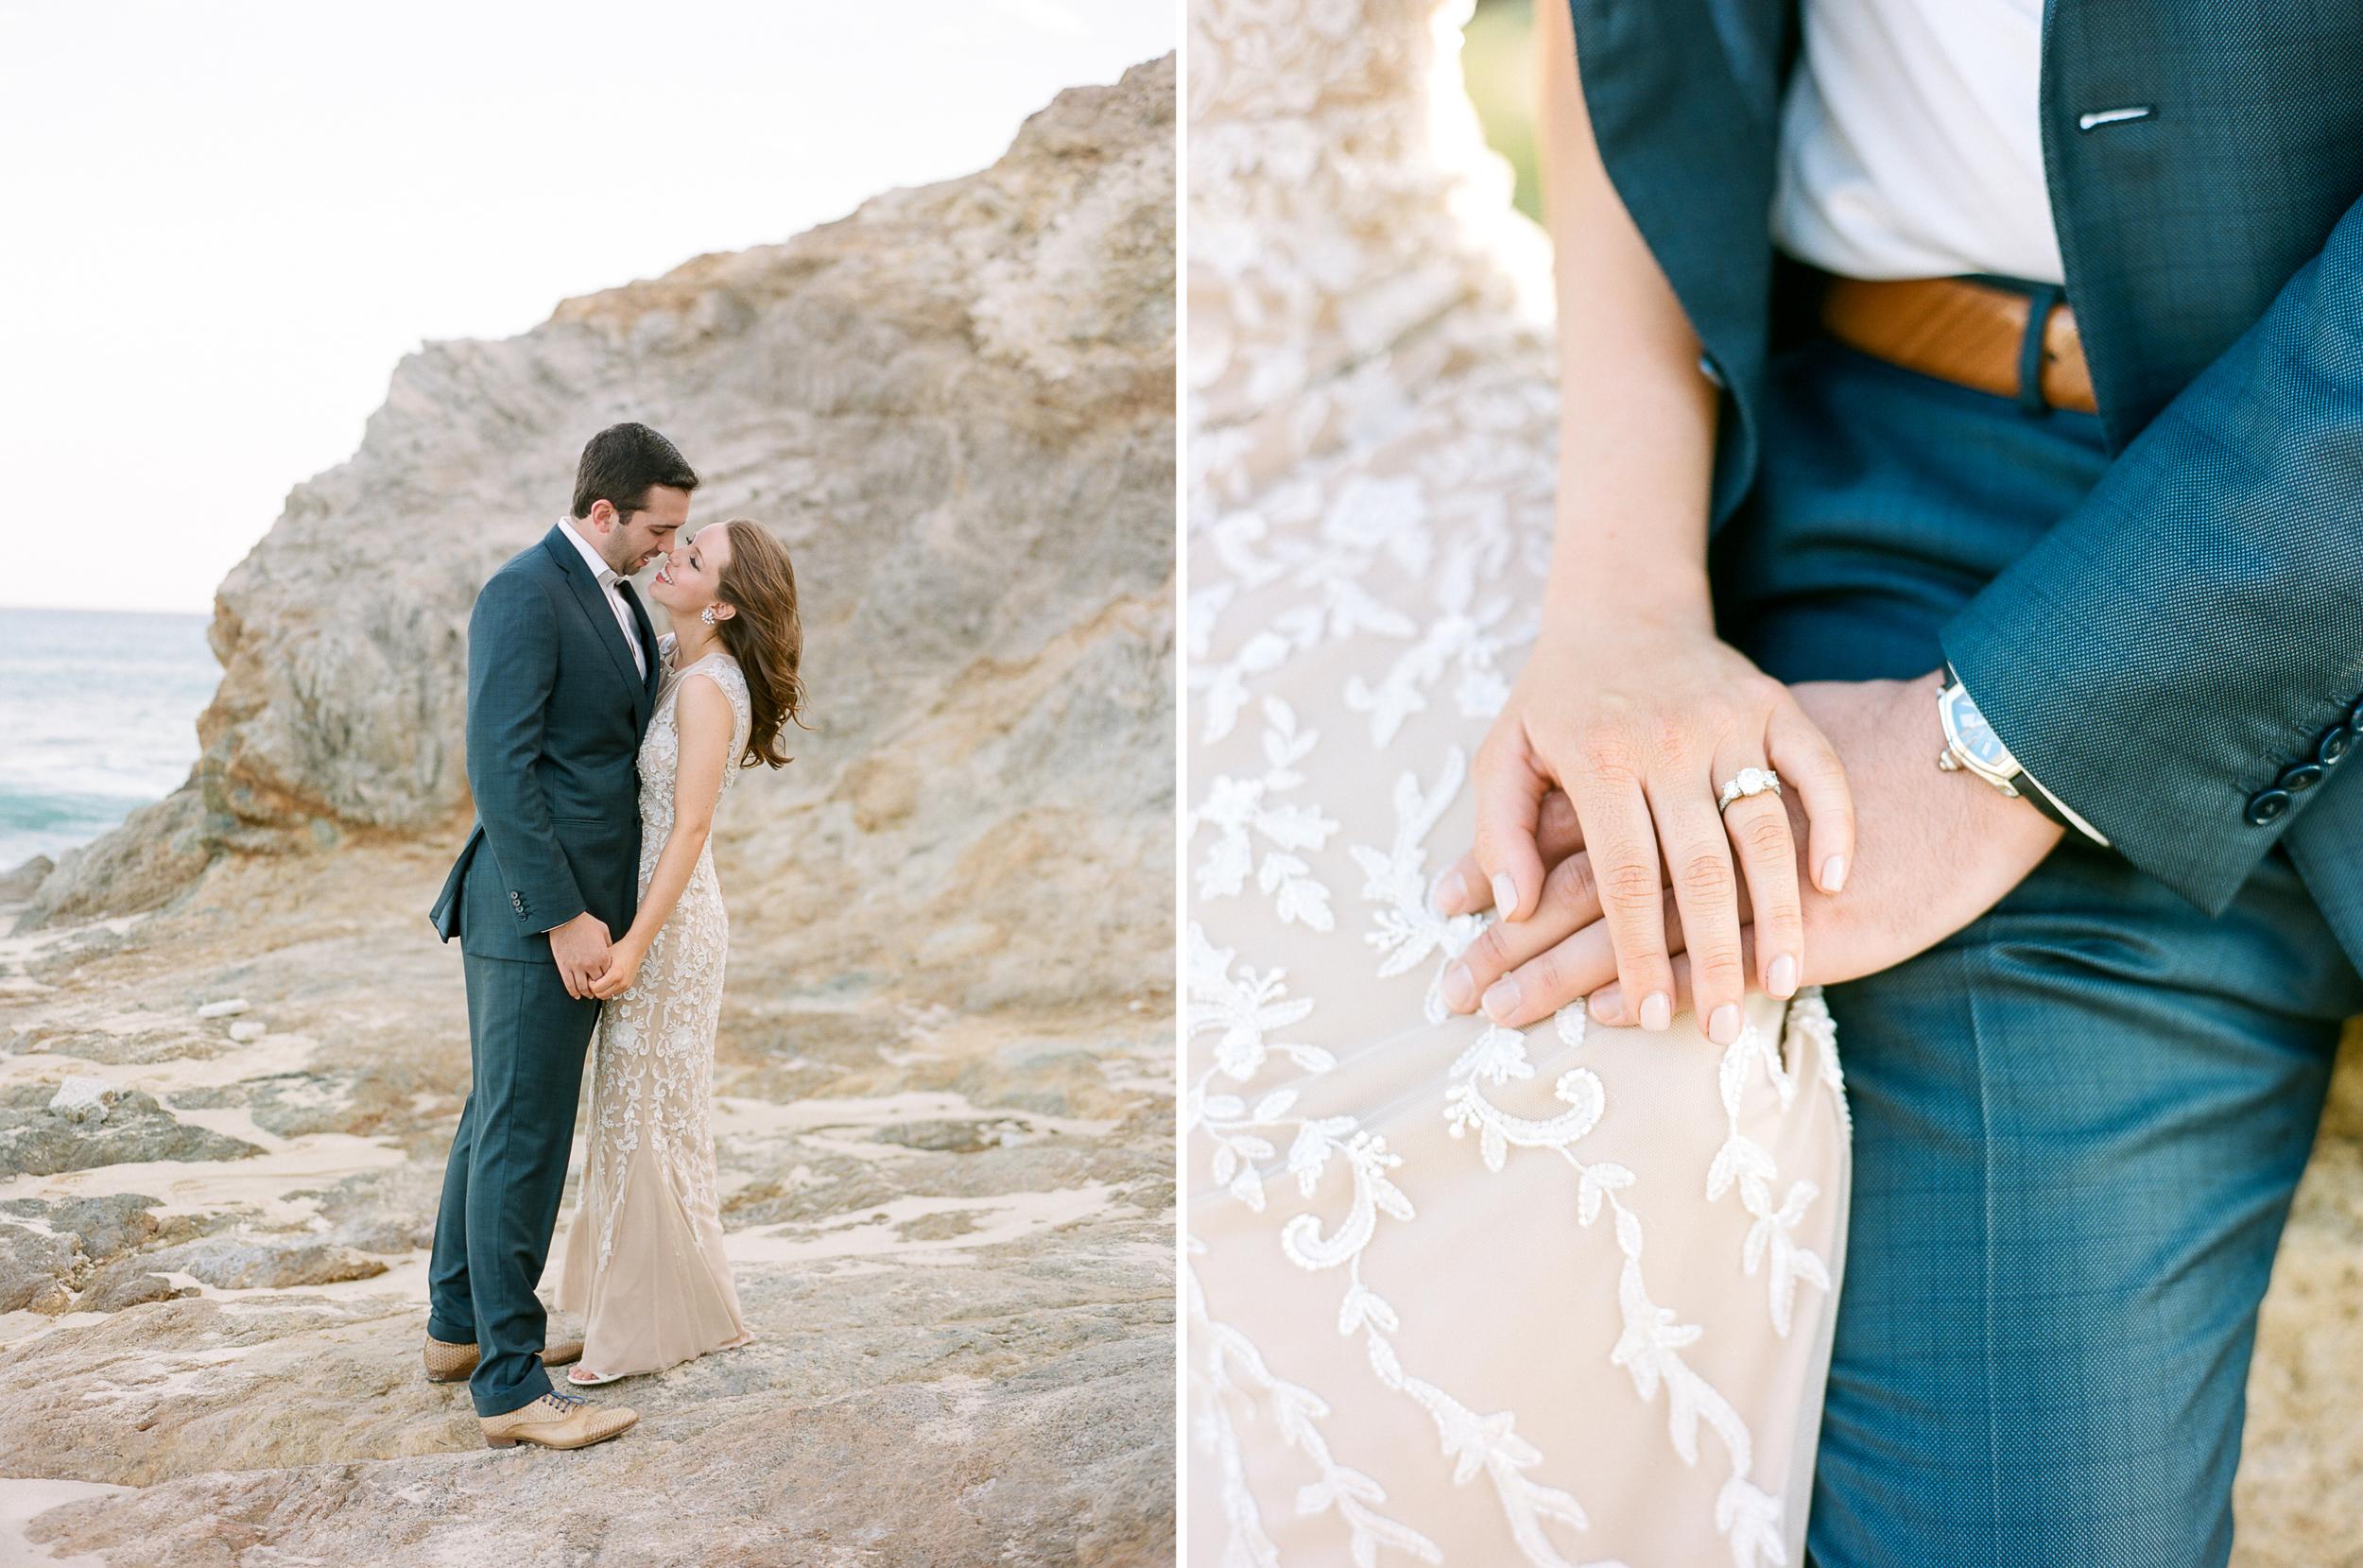 Dana-Fernandez-Photography-Destination-Wedding-Photographer-Cabo-San-Lucas-Film-Houston-Texas-Cabo-106.jpg